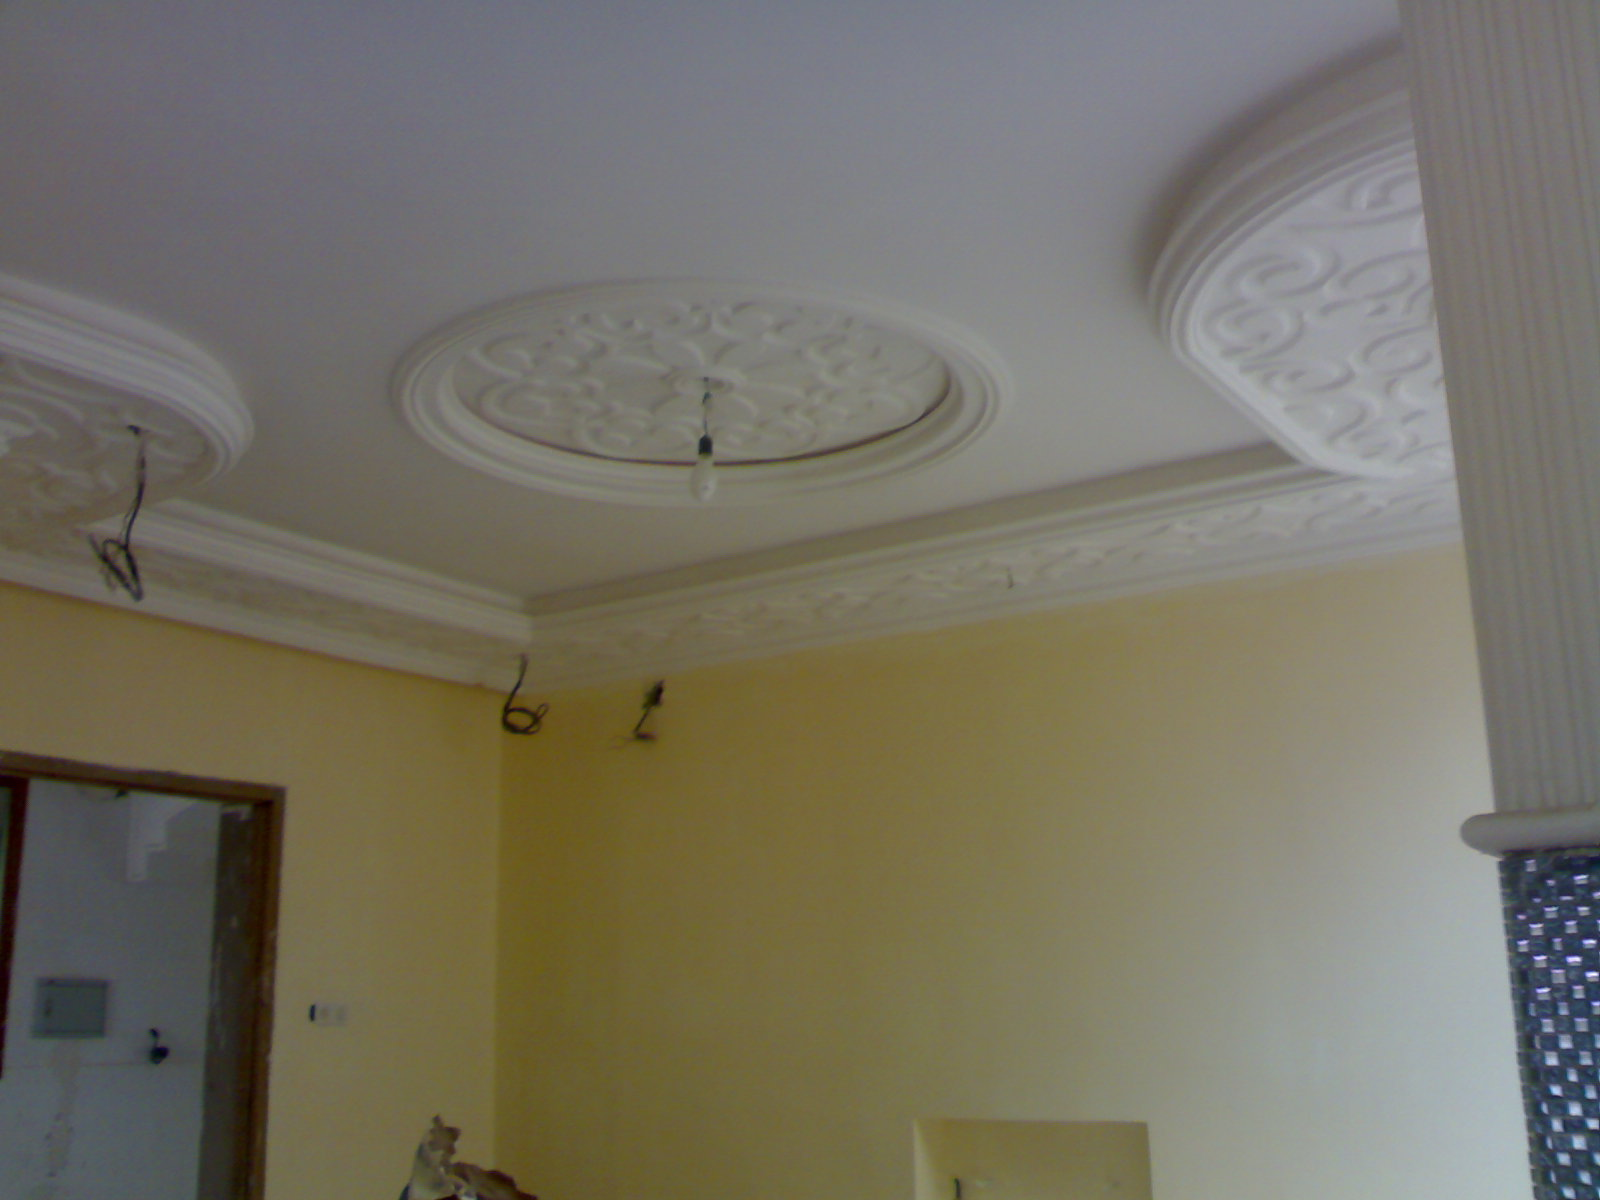 Pl tre plafond marocaines ms timicha d coration marocaine for Decoration platre plafond marocain